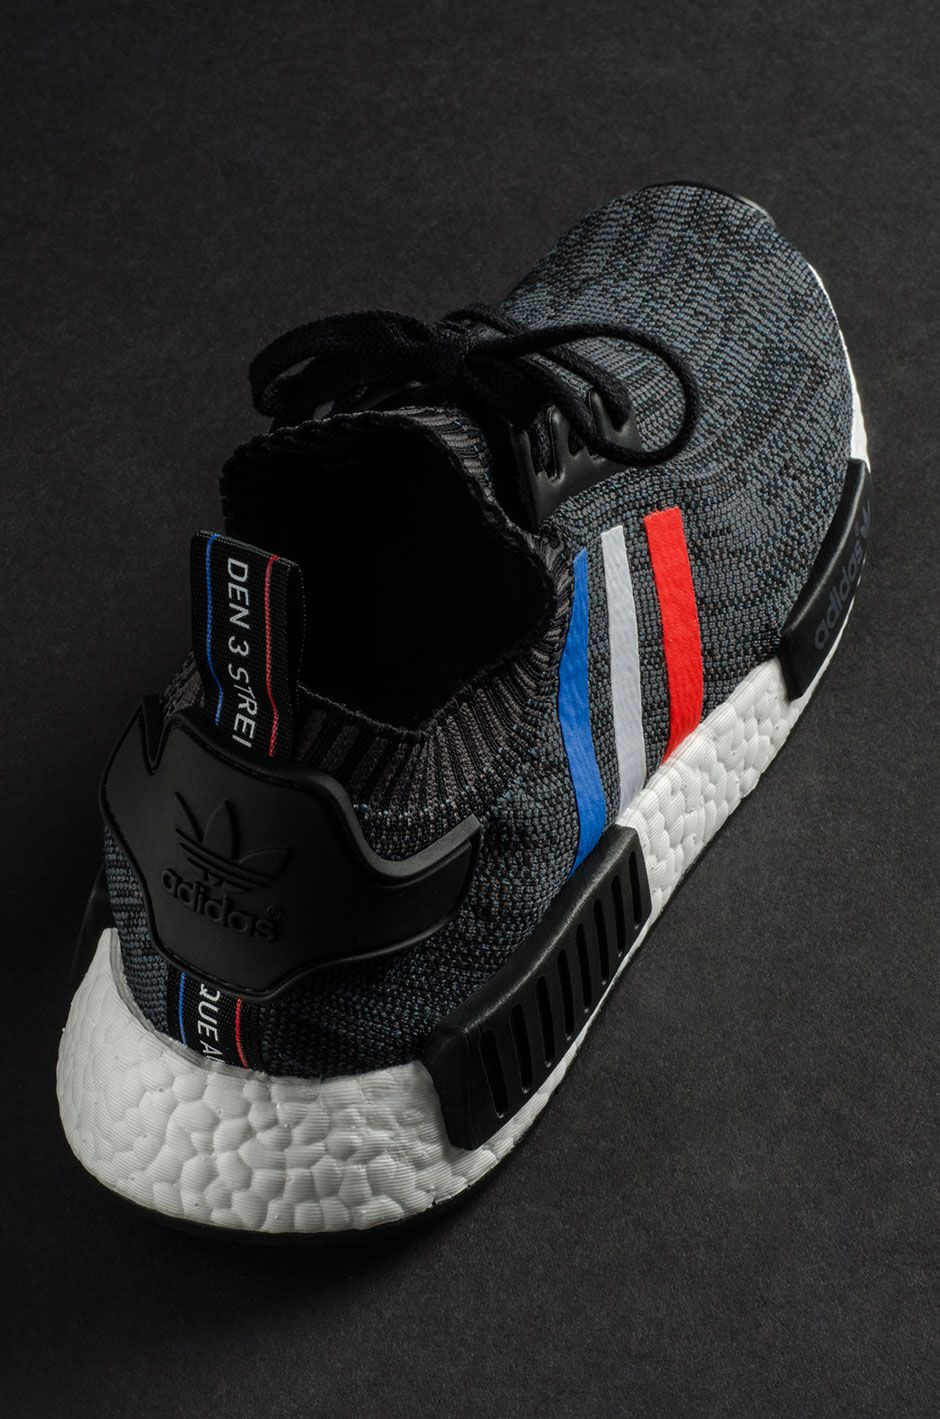 adidas nmd 3 color